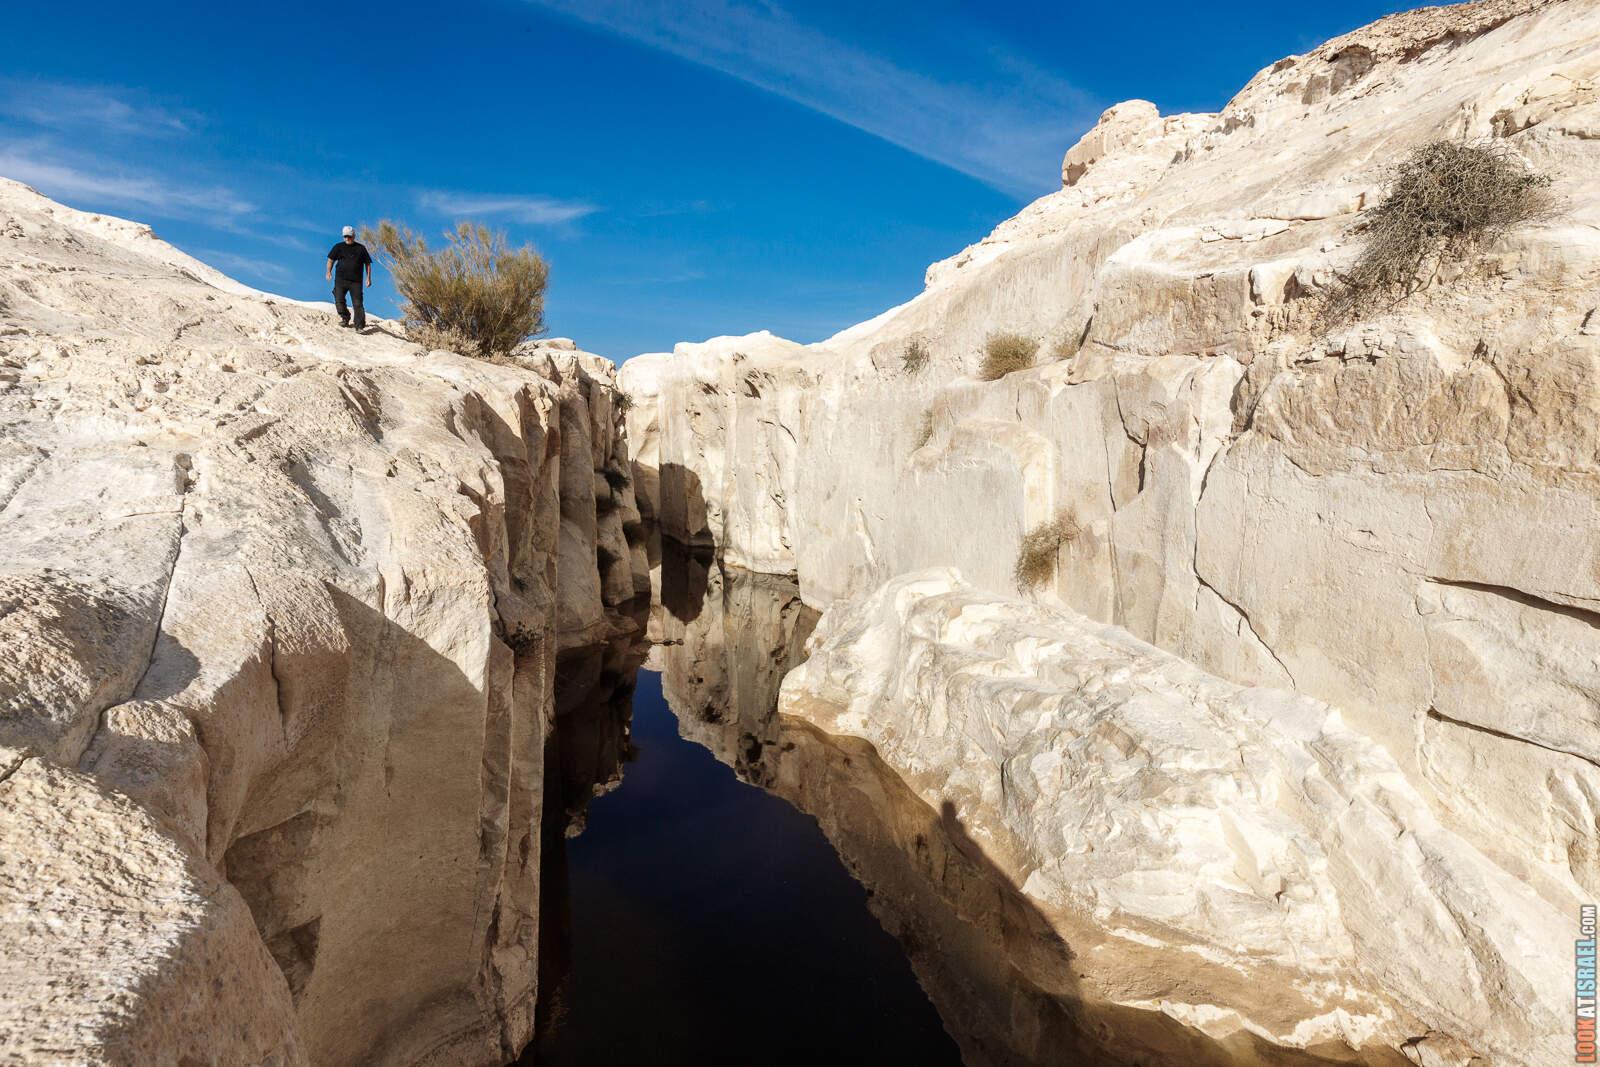 Белый каньон в пустыне Негев (гора Карком) | White canyon in Negev desert | קניון הלבן בננגב | LookAtIsrael.com - Фото путешествия по Израилю